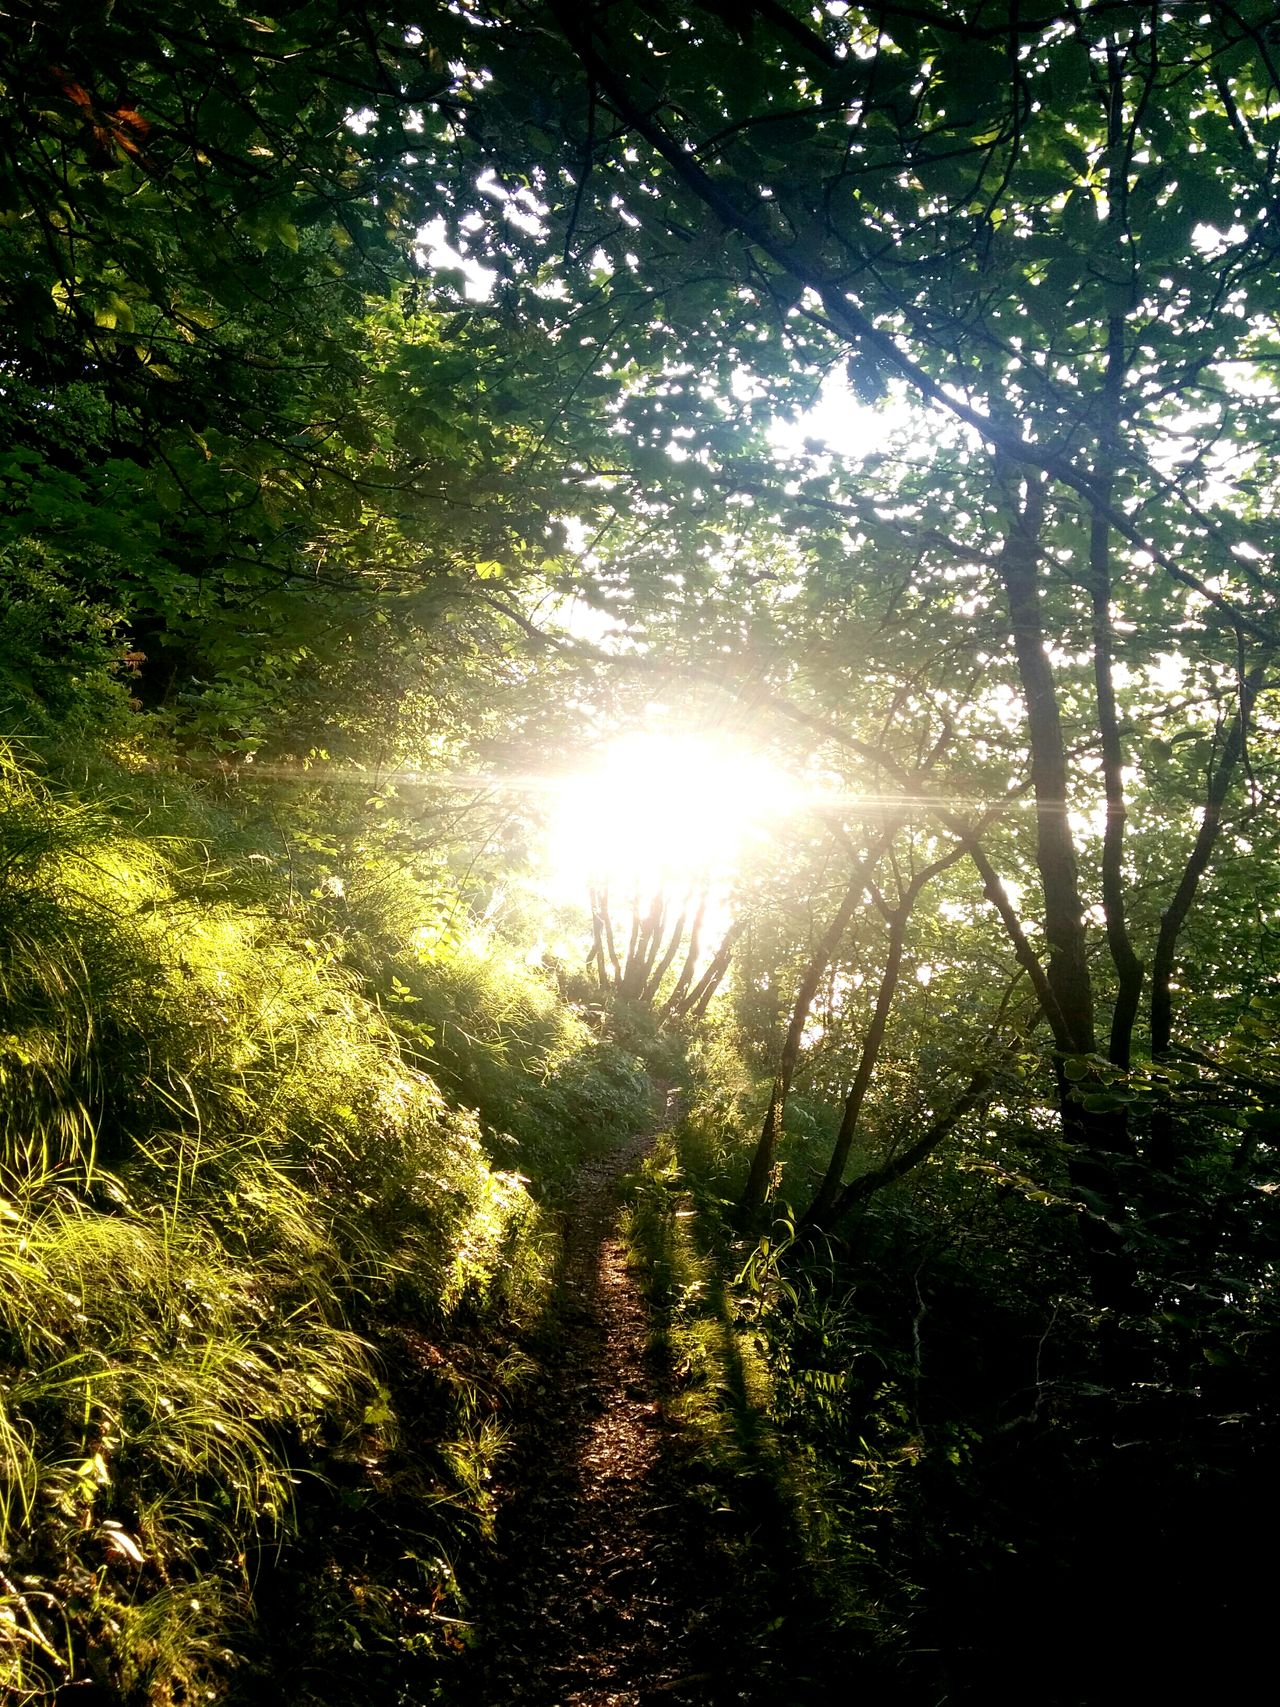 Capturing Freedom Run, breathe, shine: be free. Towards The Light On The Path EyeEm Best Shots EyeEm Nature Lover A Walk In The Woods Runningman Trailrunning BREATHEfree Nature On Your Doorstep